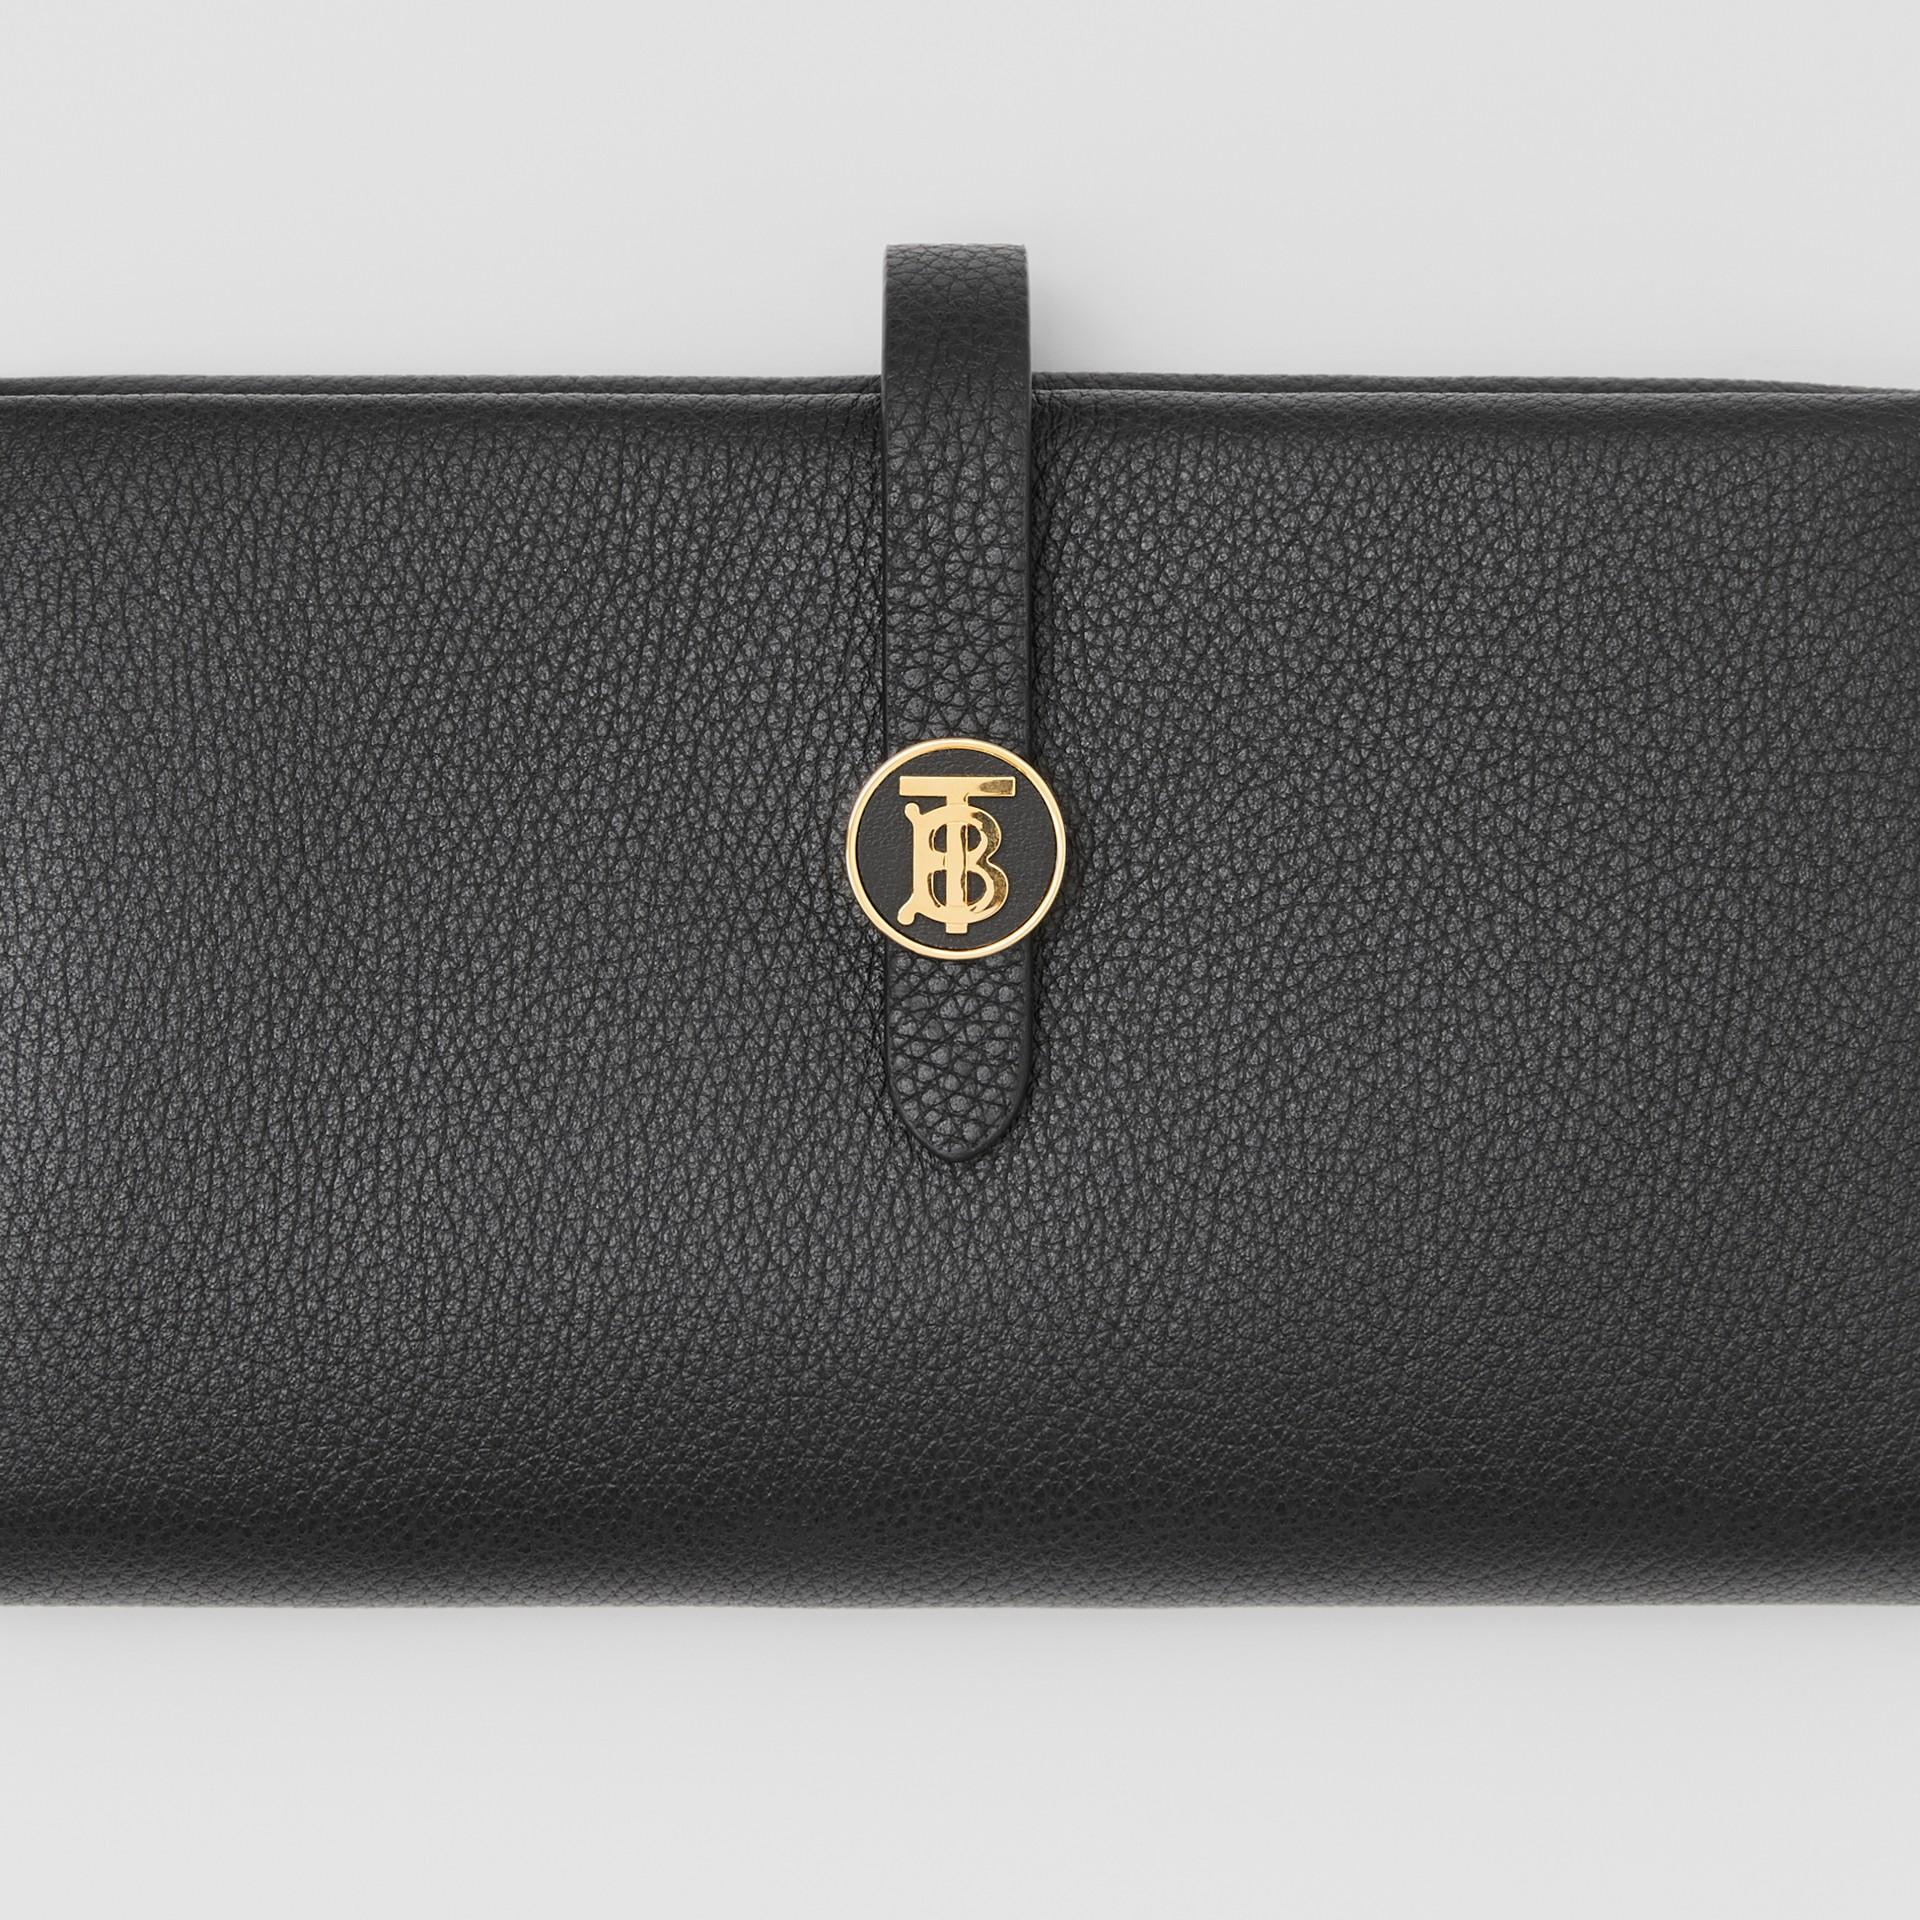 Monogram Motif Grainy Leather Folding Wallet in Black - Women | Burberry - gallery image 5